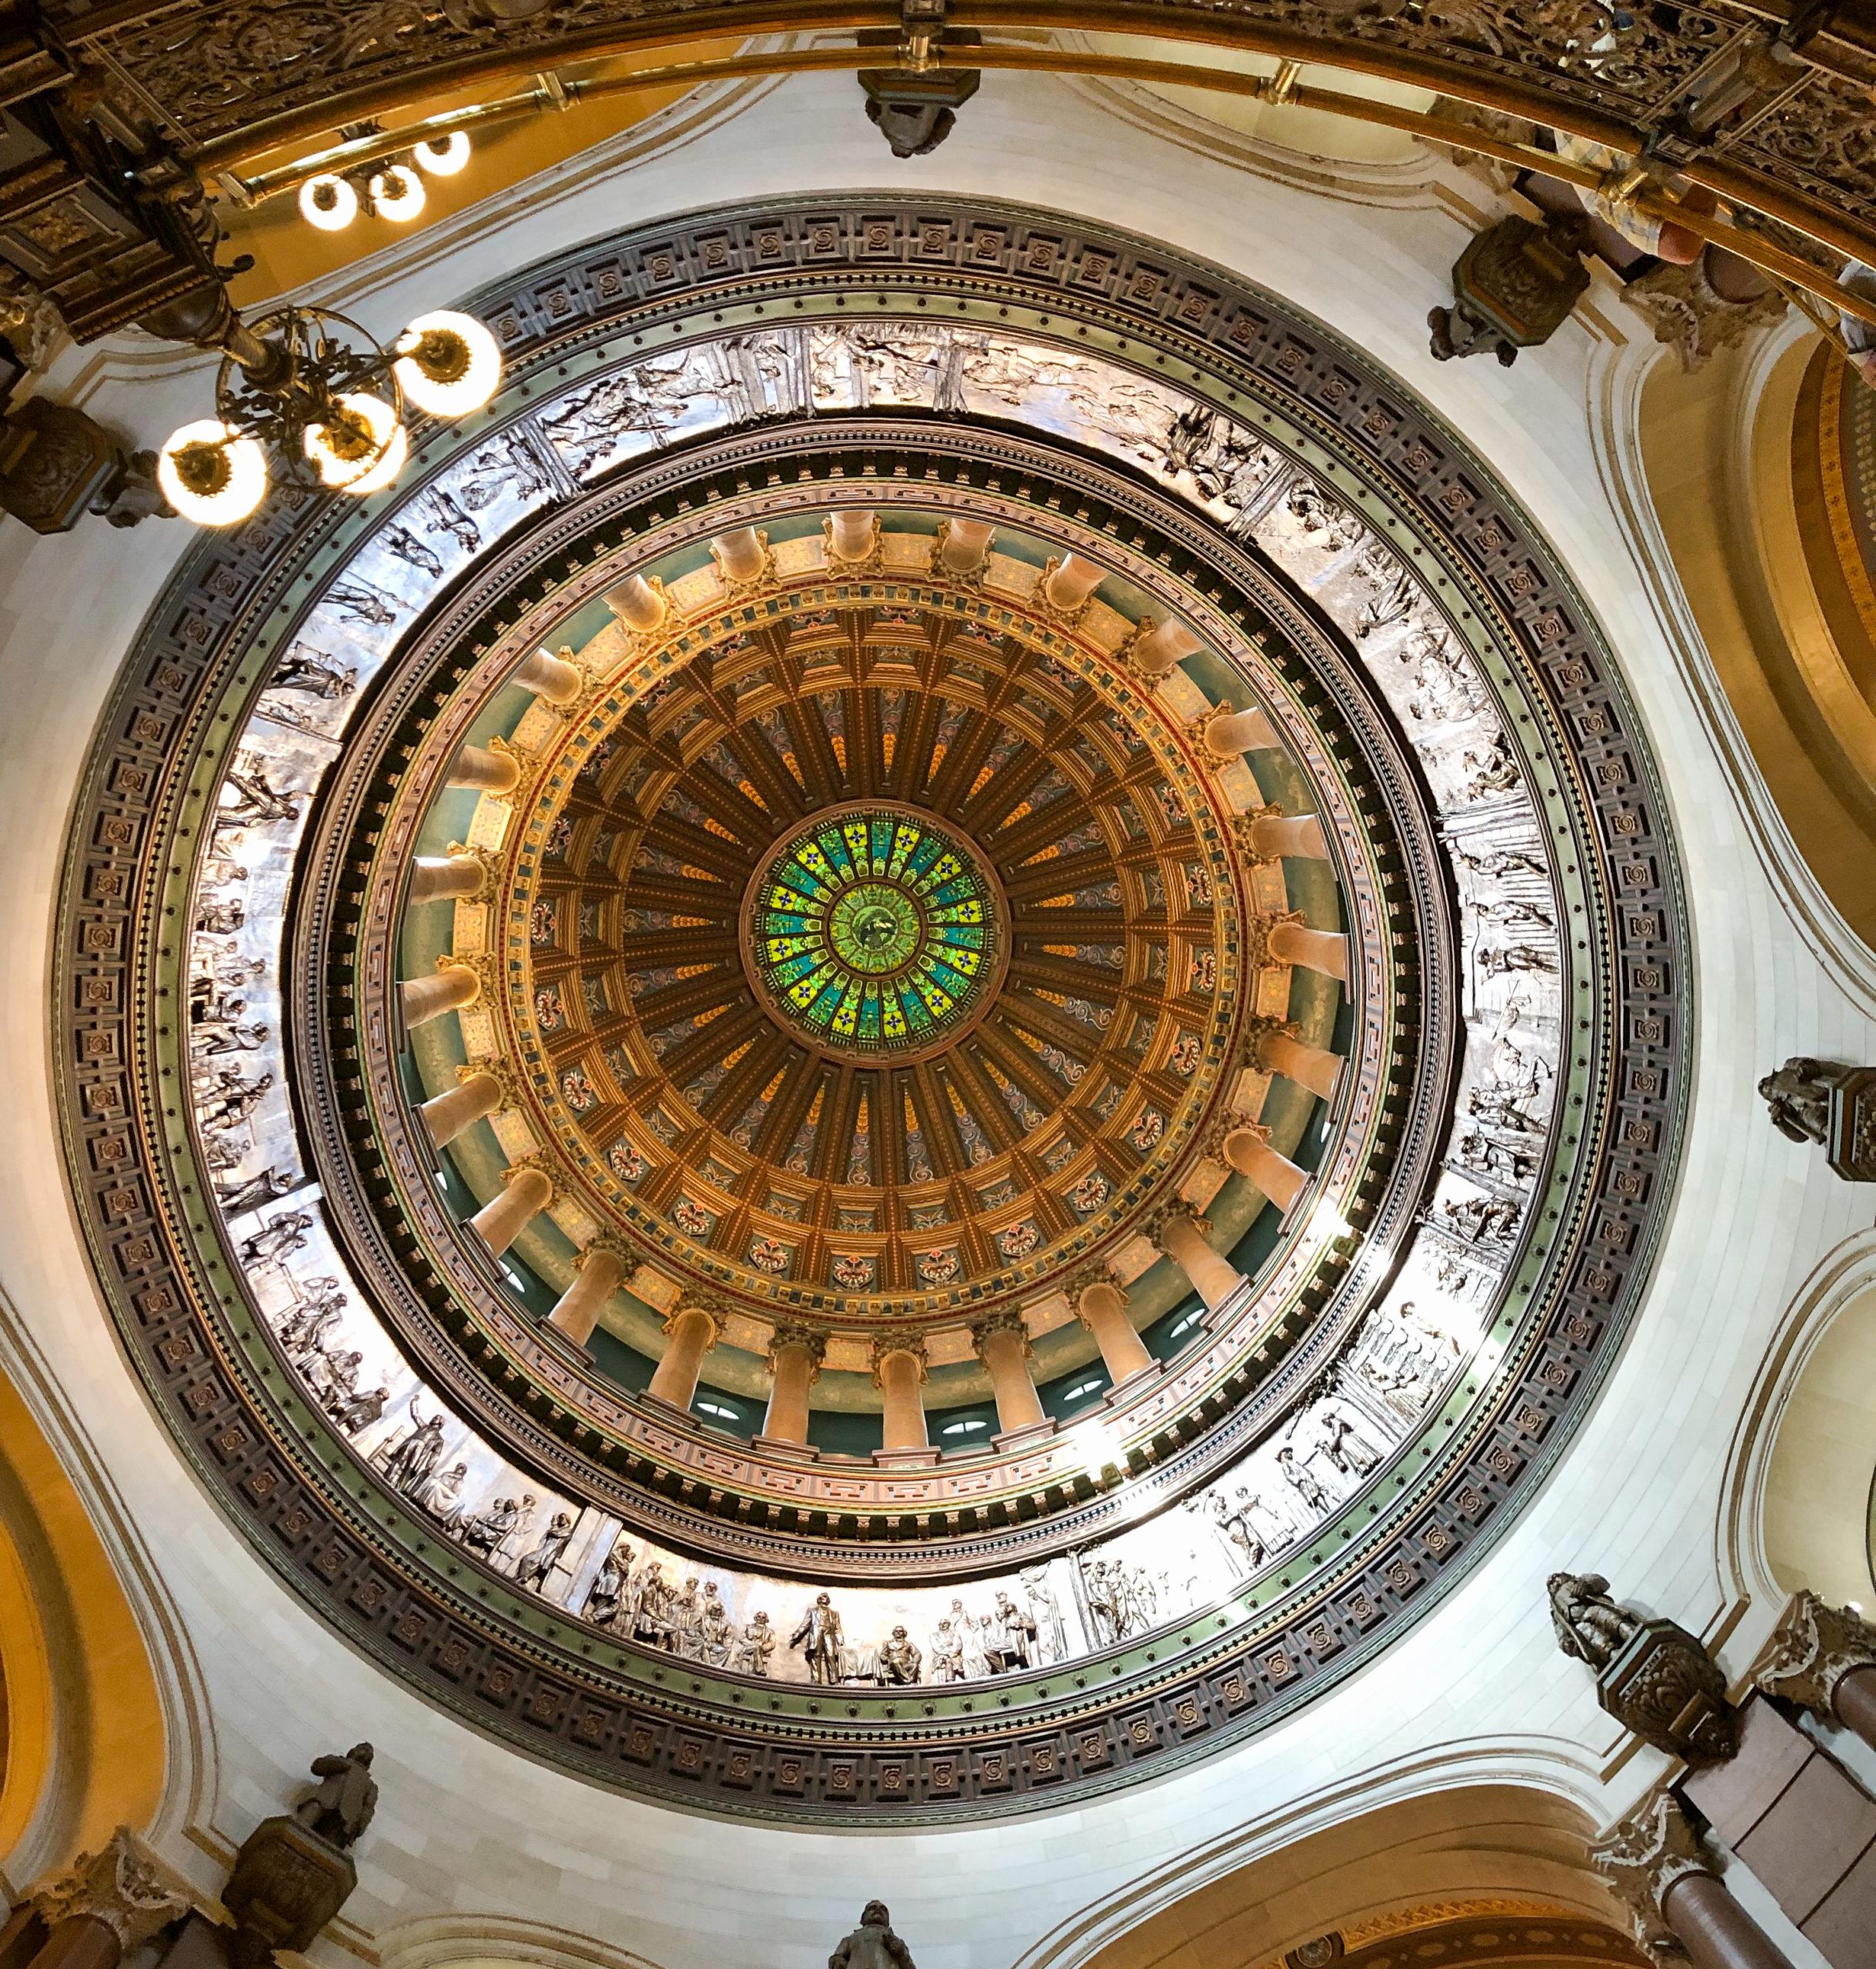 Die Kuppel des State Capitol in Springfield, Illinois, wo Abraham Lincoln Rechtsanawalt war